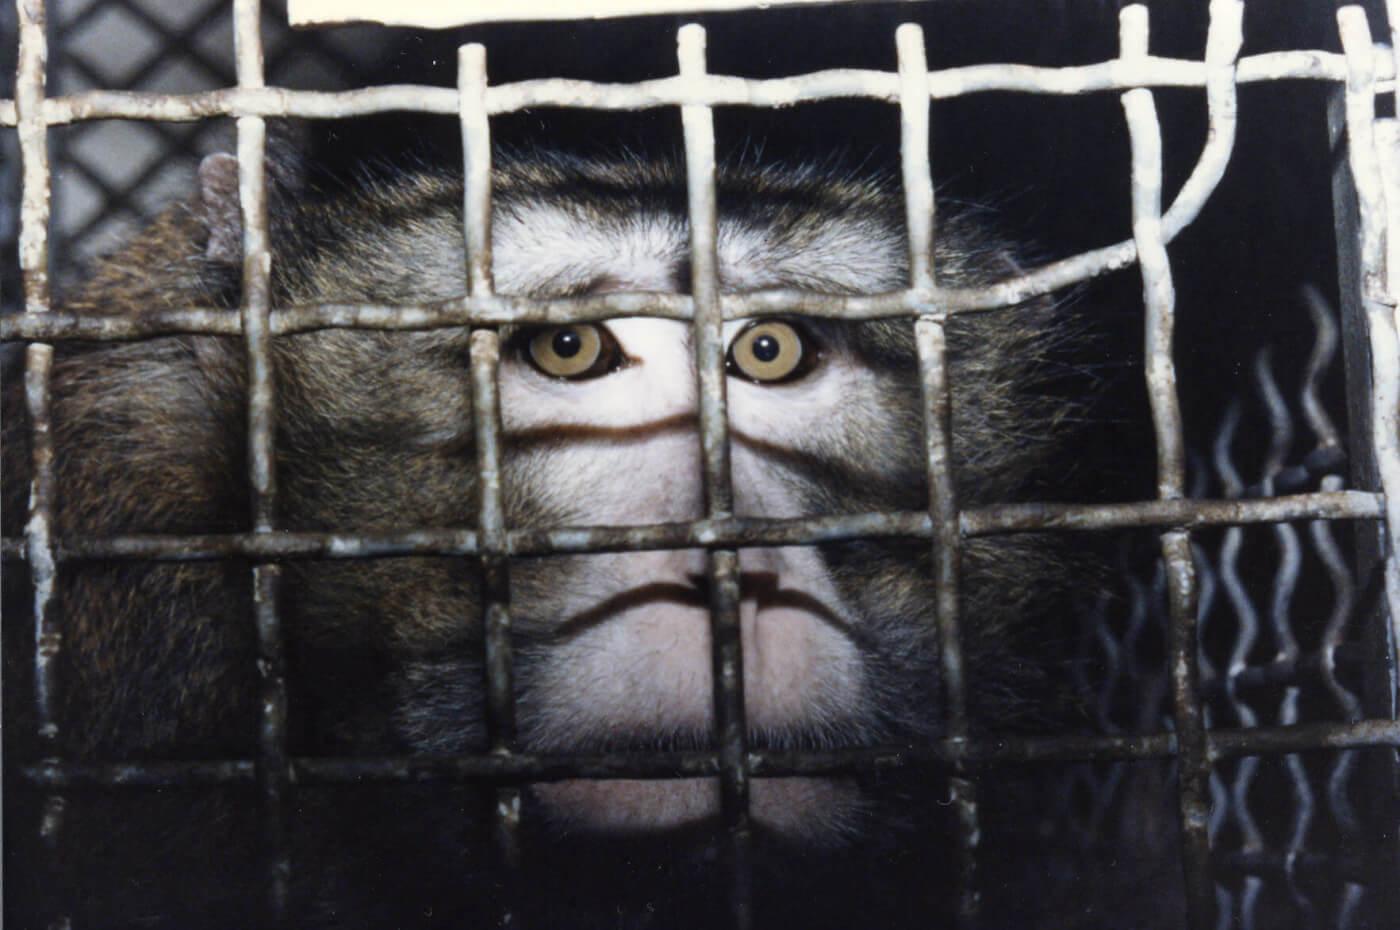 caged monkey at laboratory